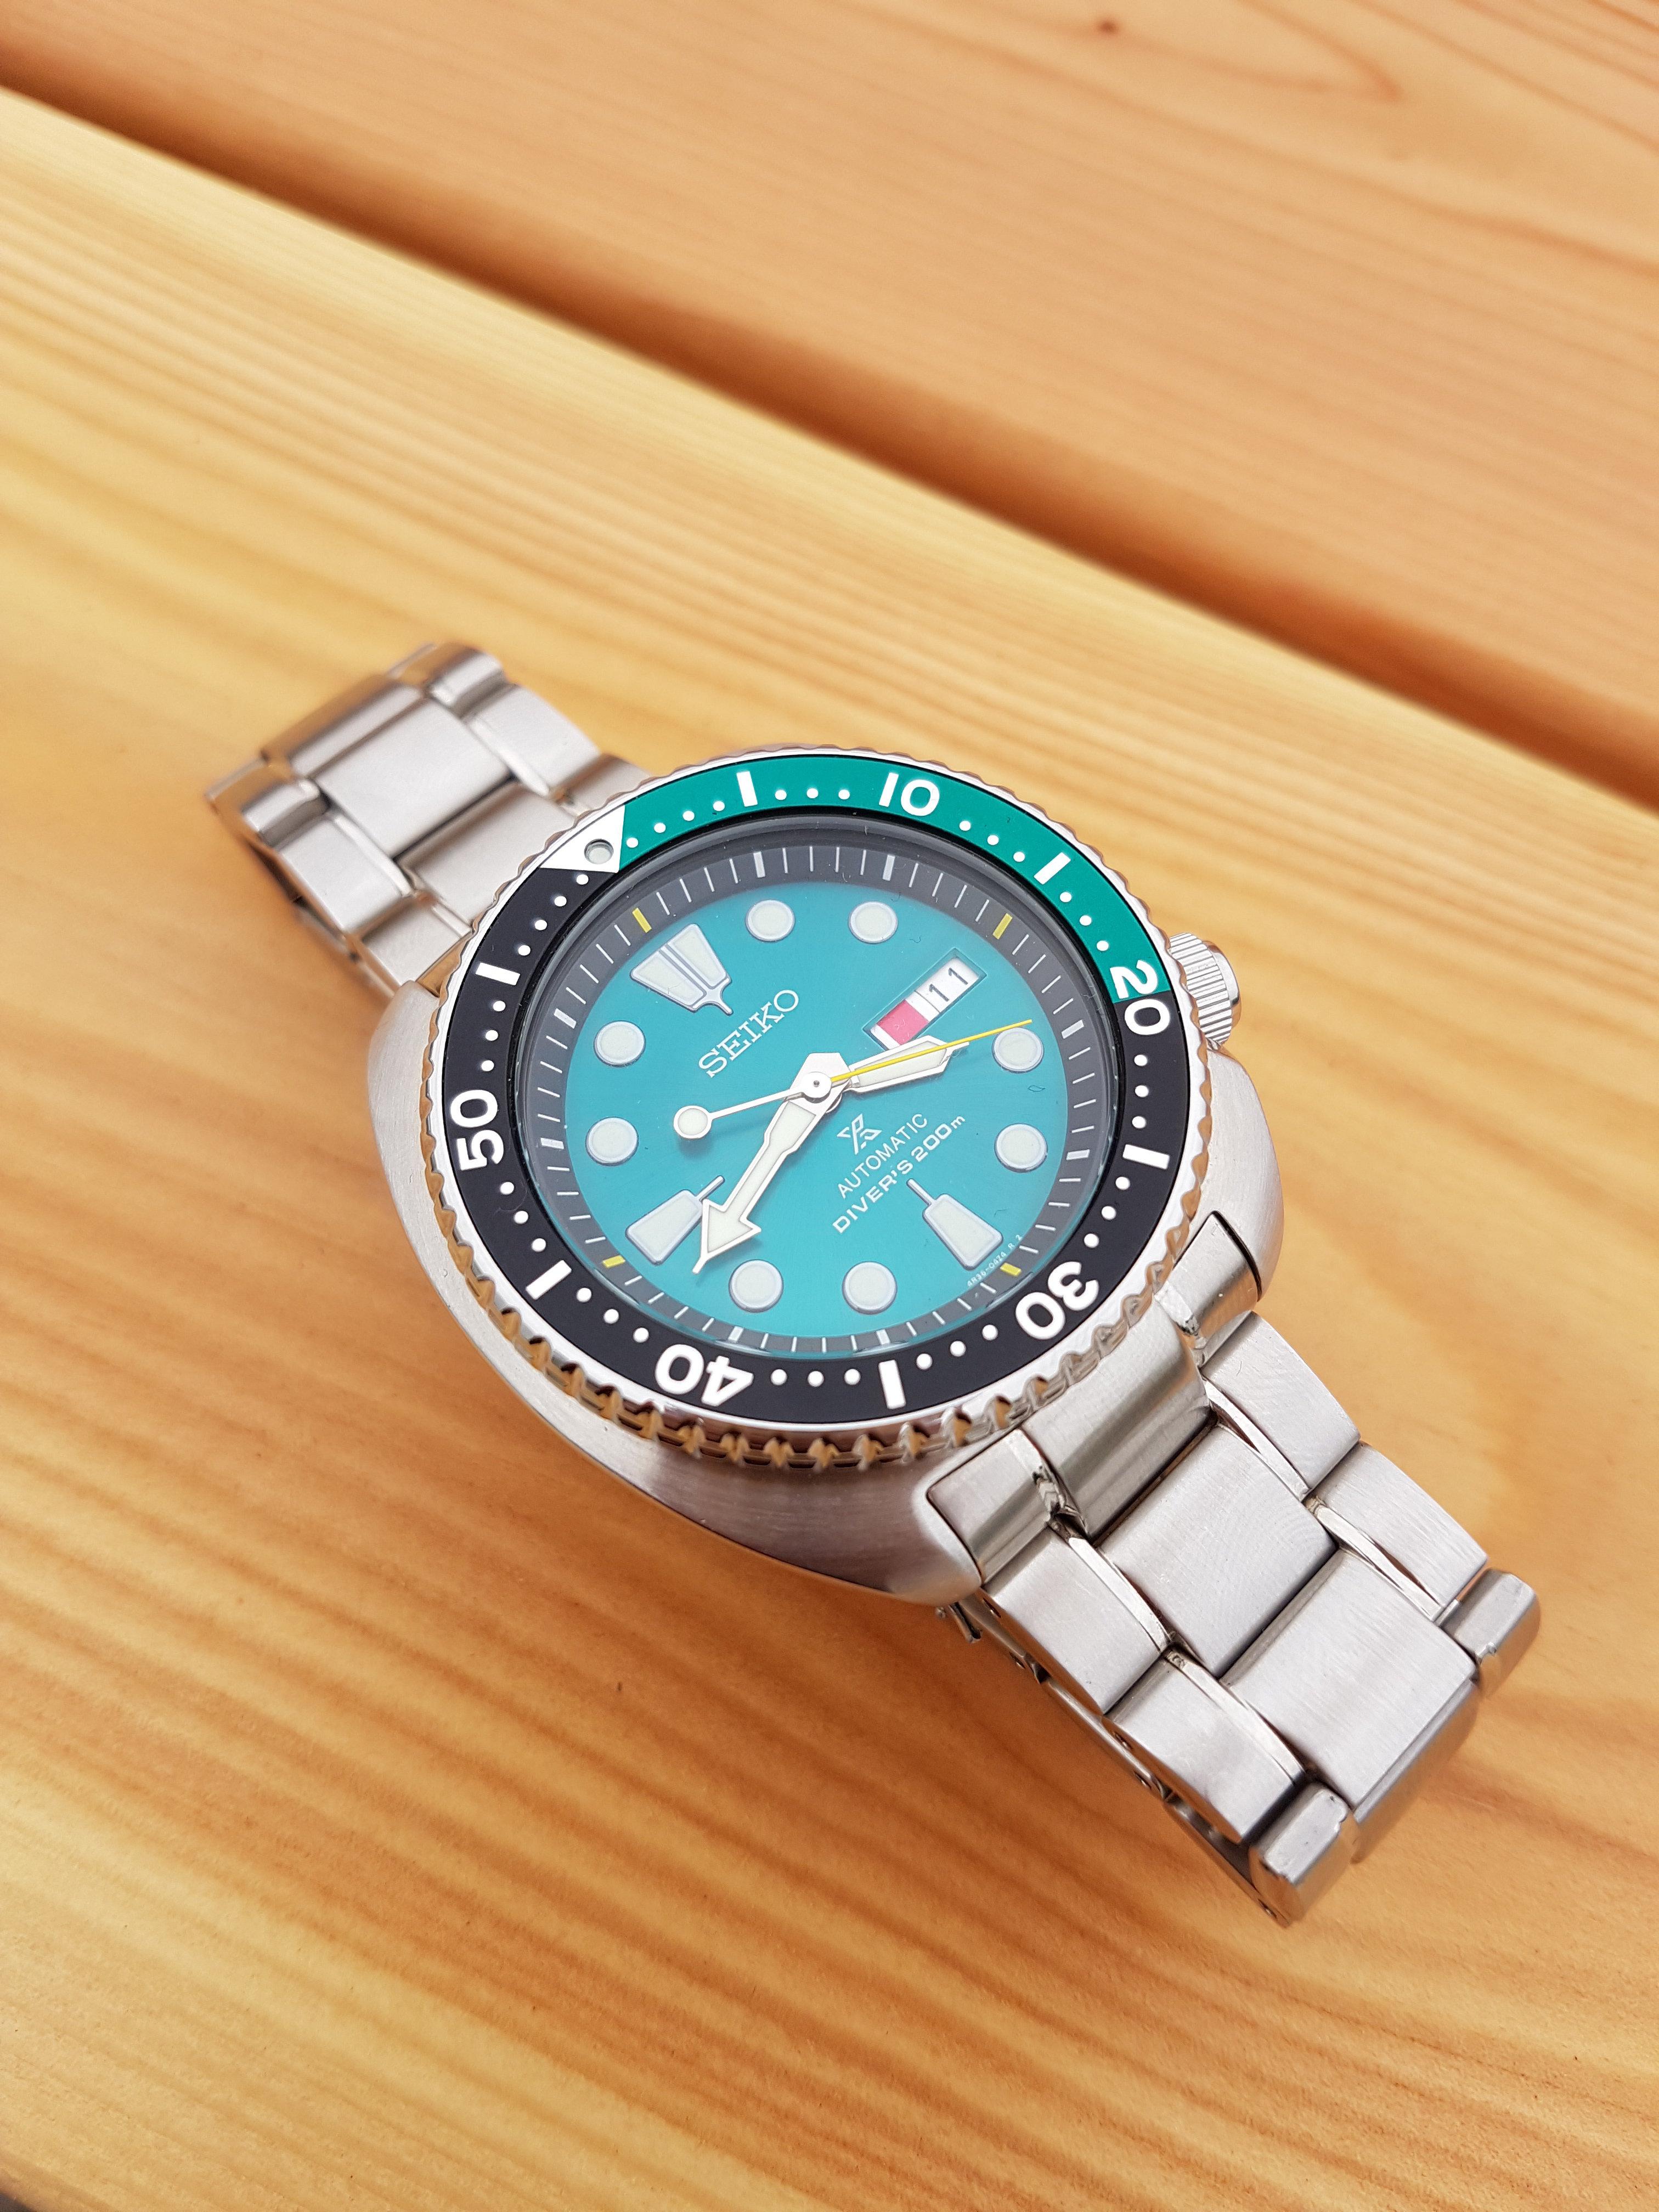 Verkocht Limited Edition Green Turtle Horlogemarktnl Seiko Srpb01 20170612 2008233024x4032 28 Mb